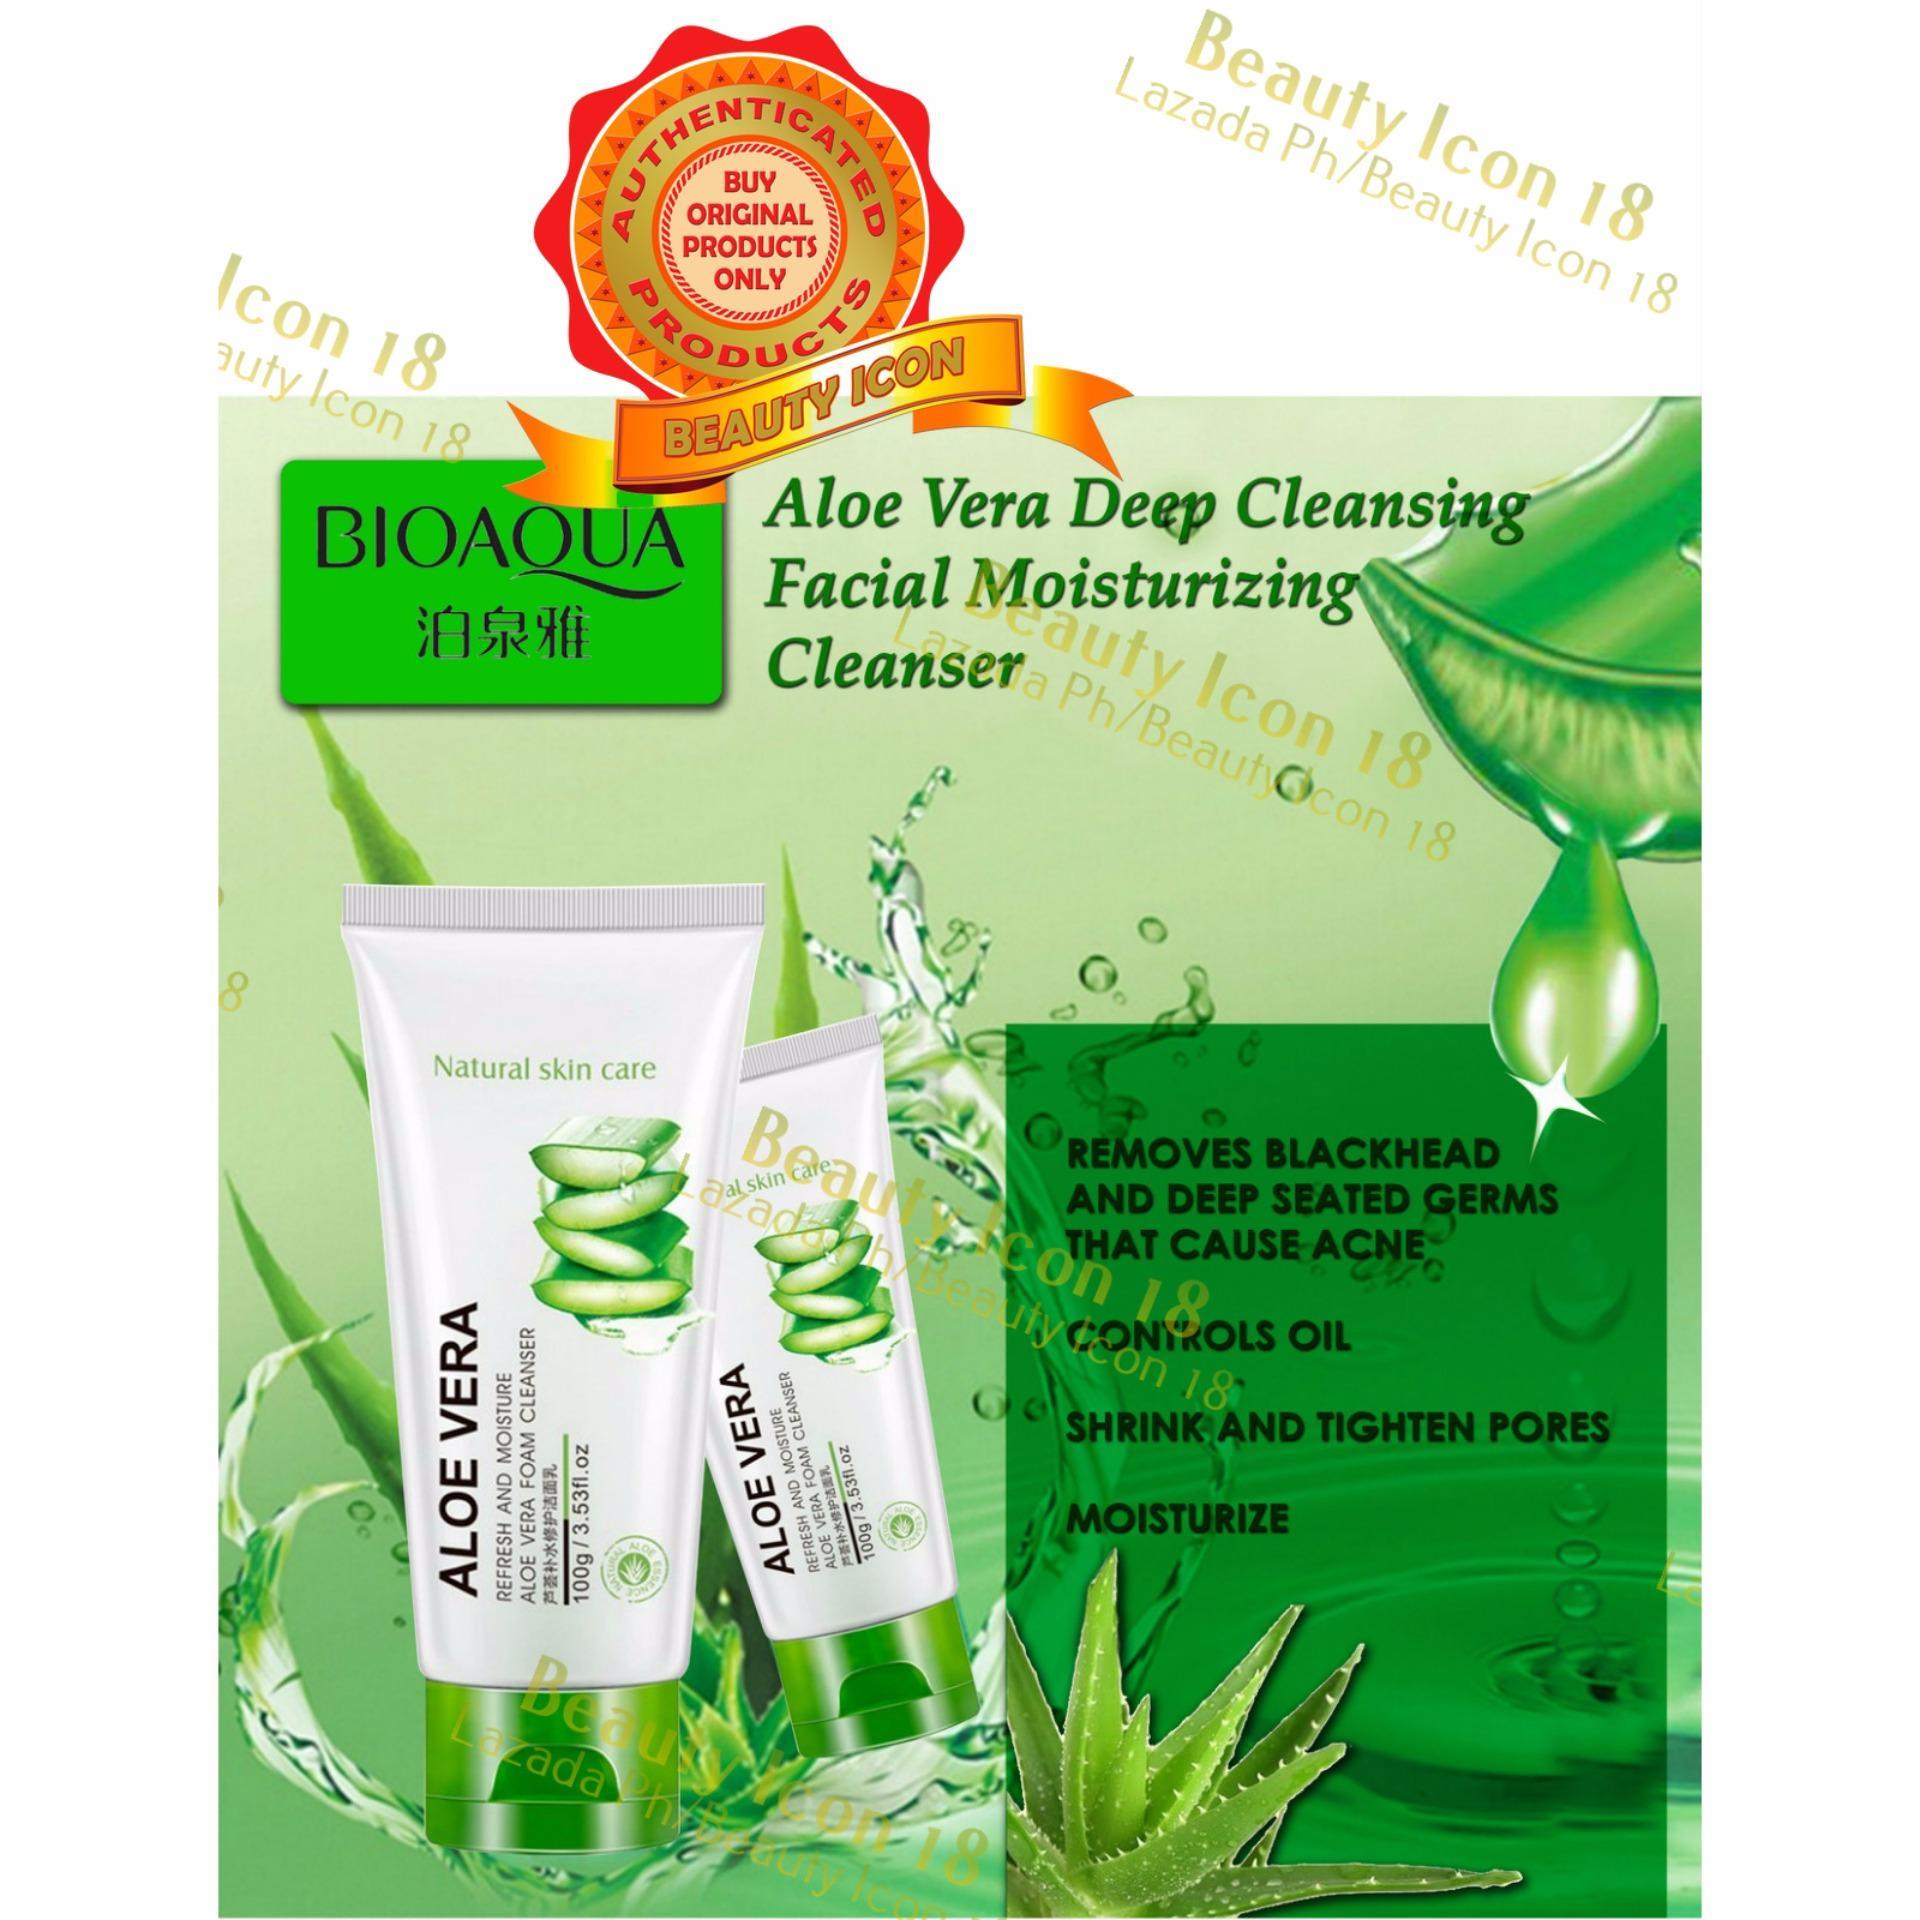 Philippines Bioaqua Natural Skin Care Moisture Aloe Vera 92 Aloevera Cleanser 100g